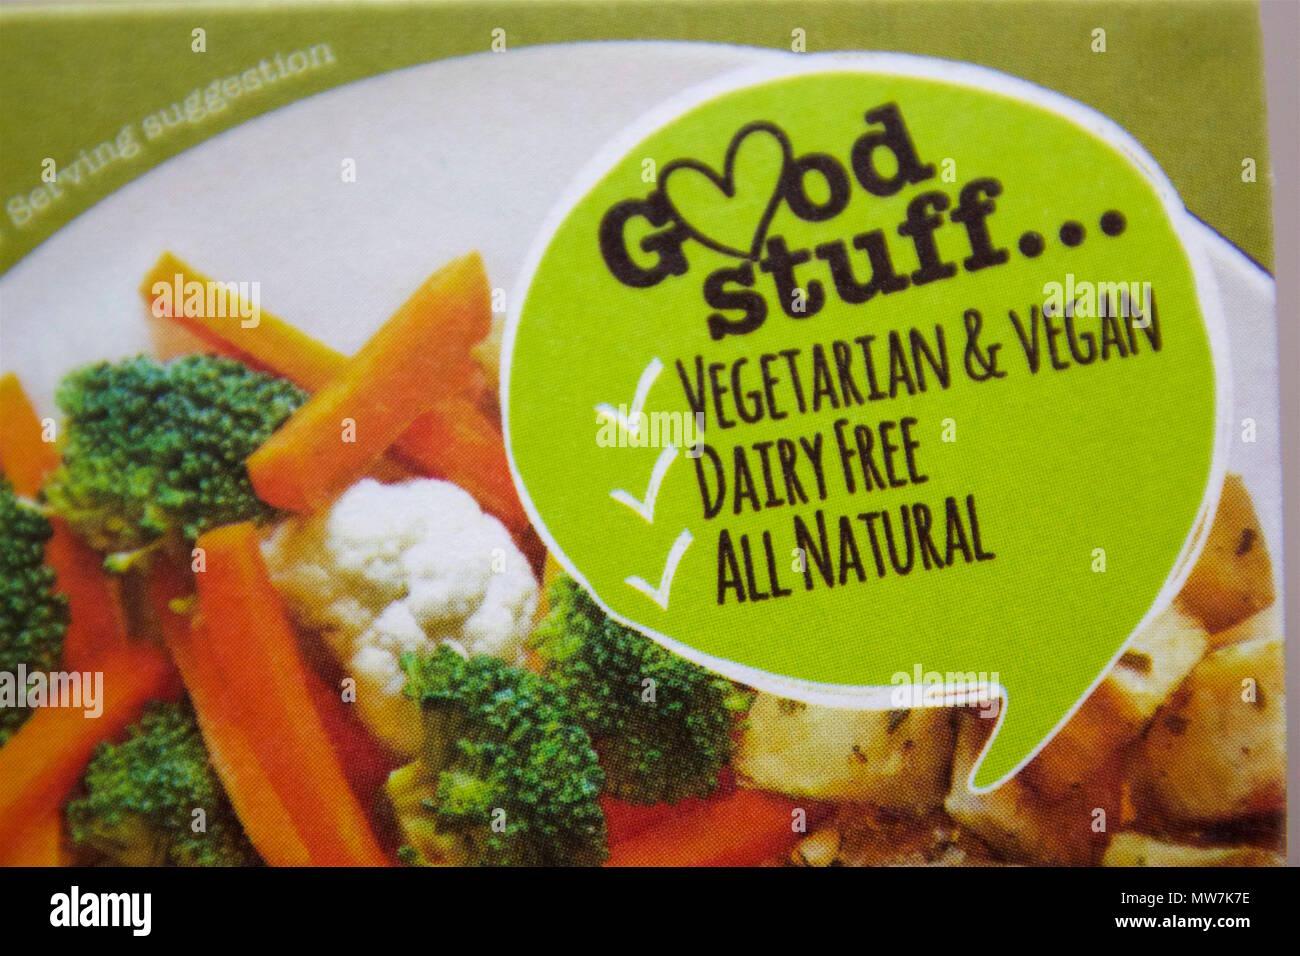 Good stuff label on food packaging: Vegetarian & Vegan, Dairy Free, All Natural - Stock Image